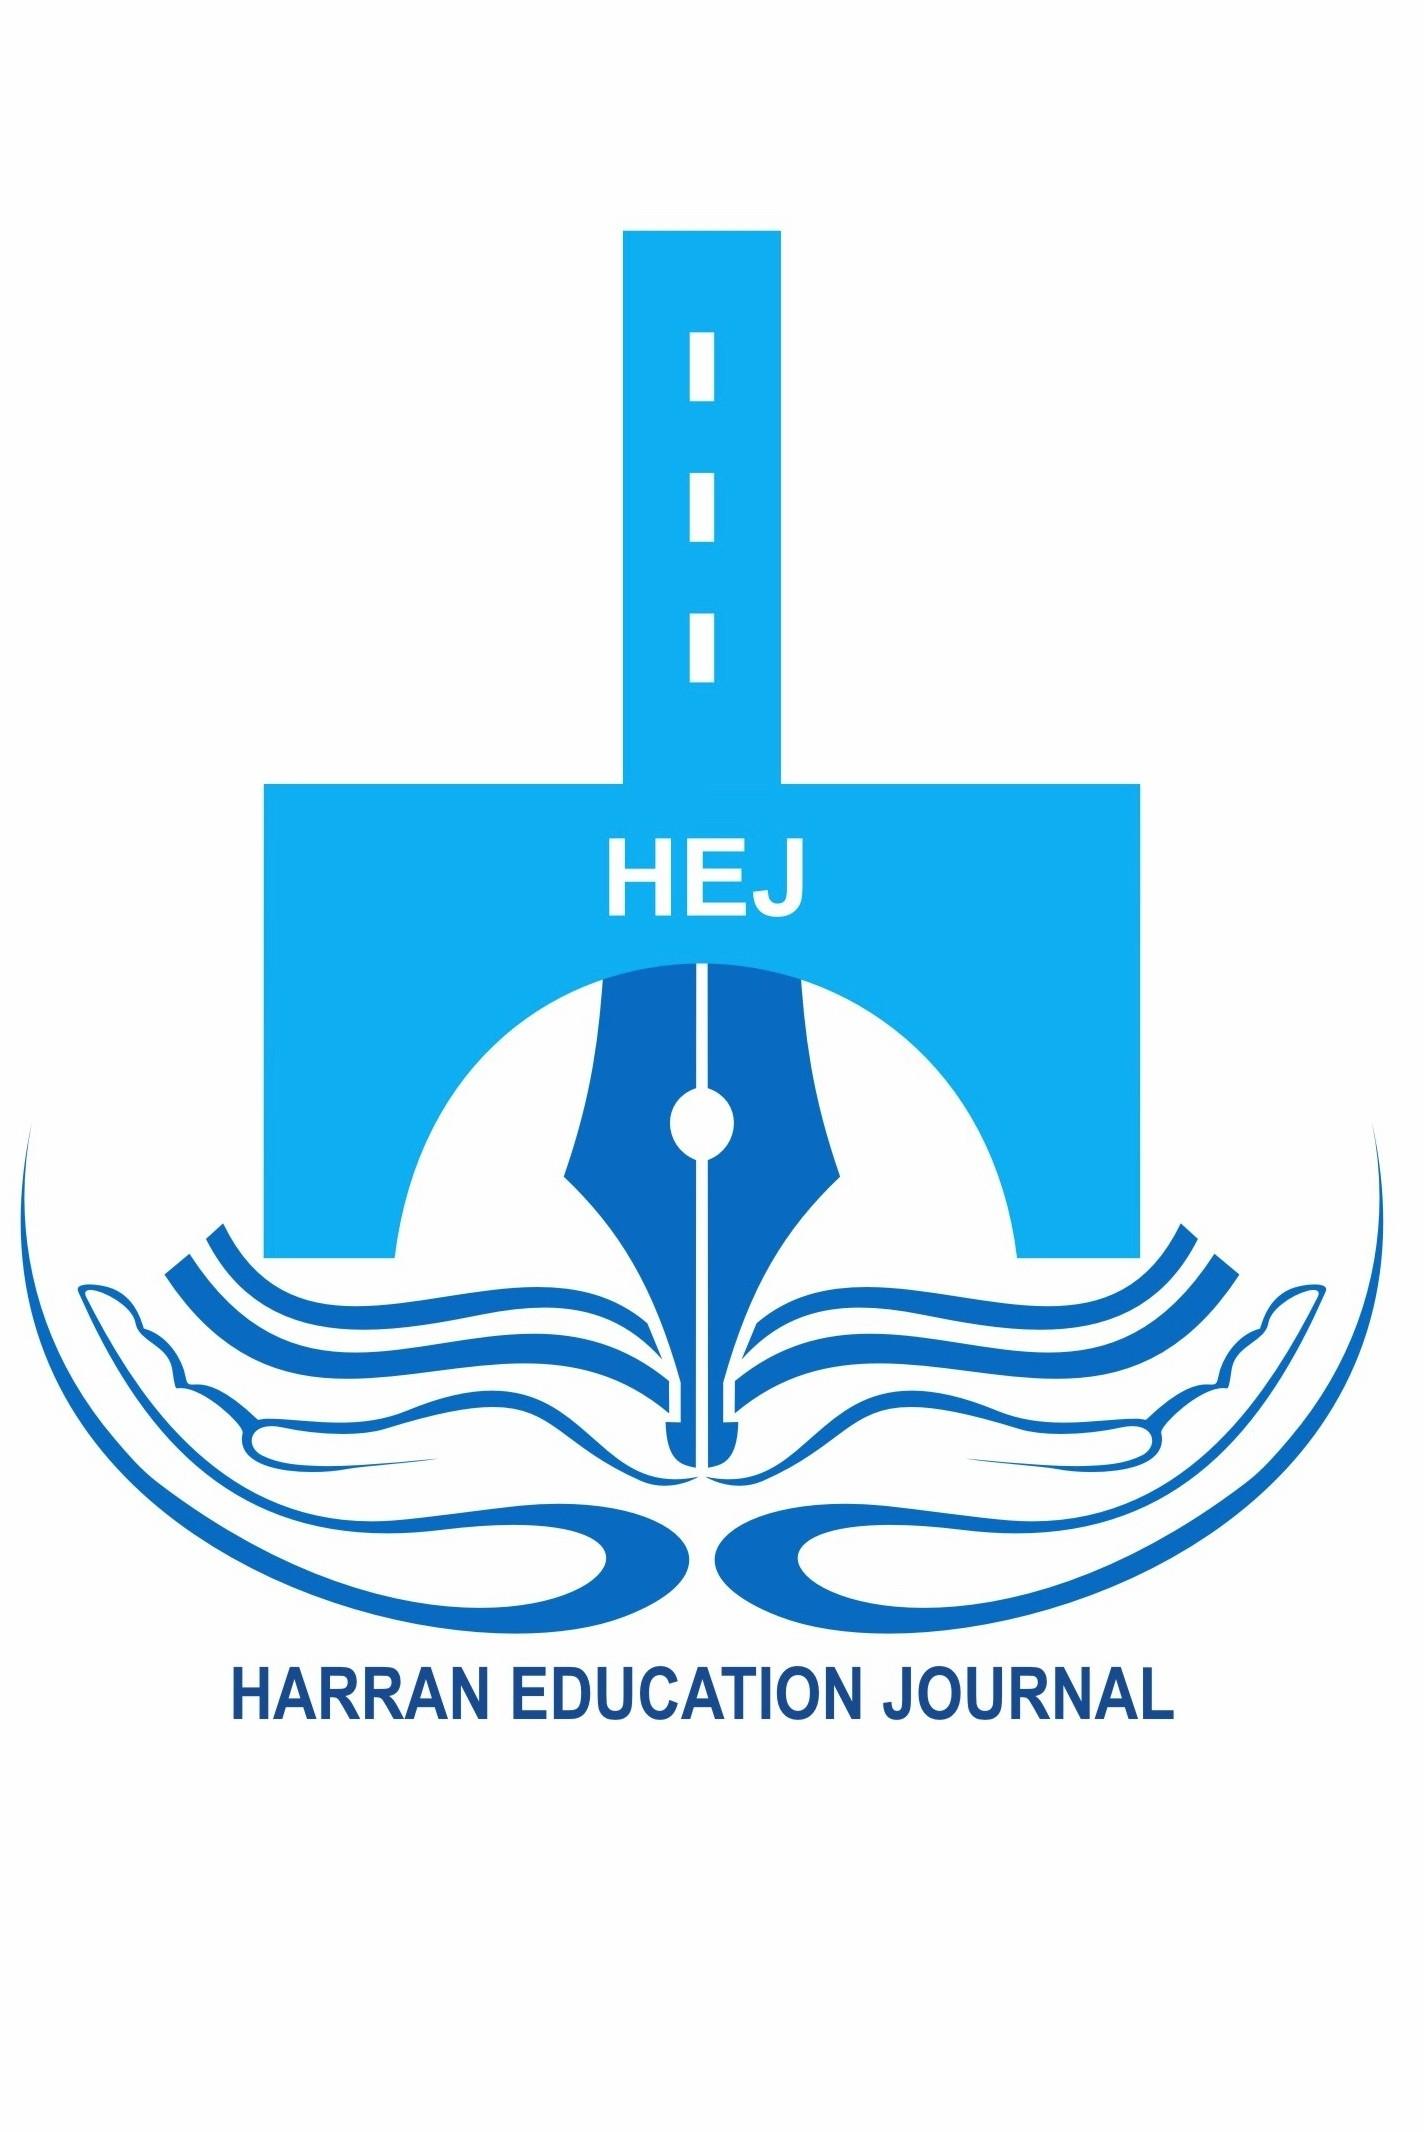 Harran Education Journal